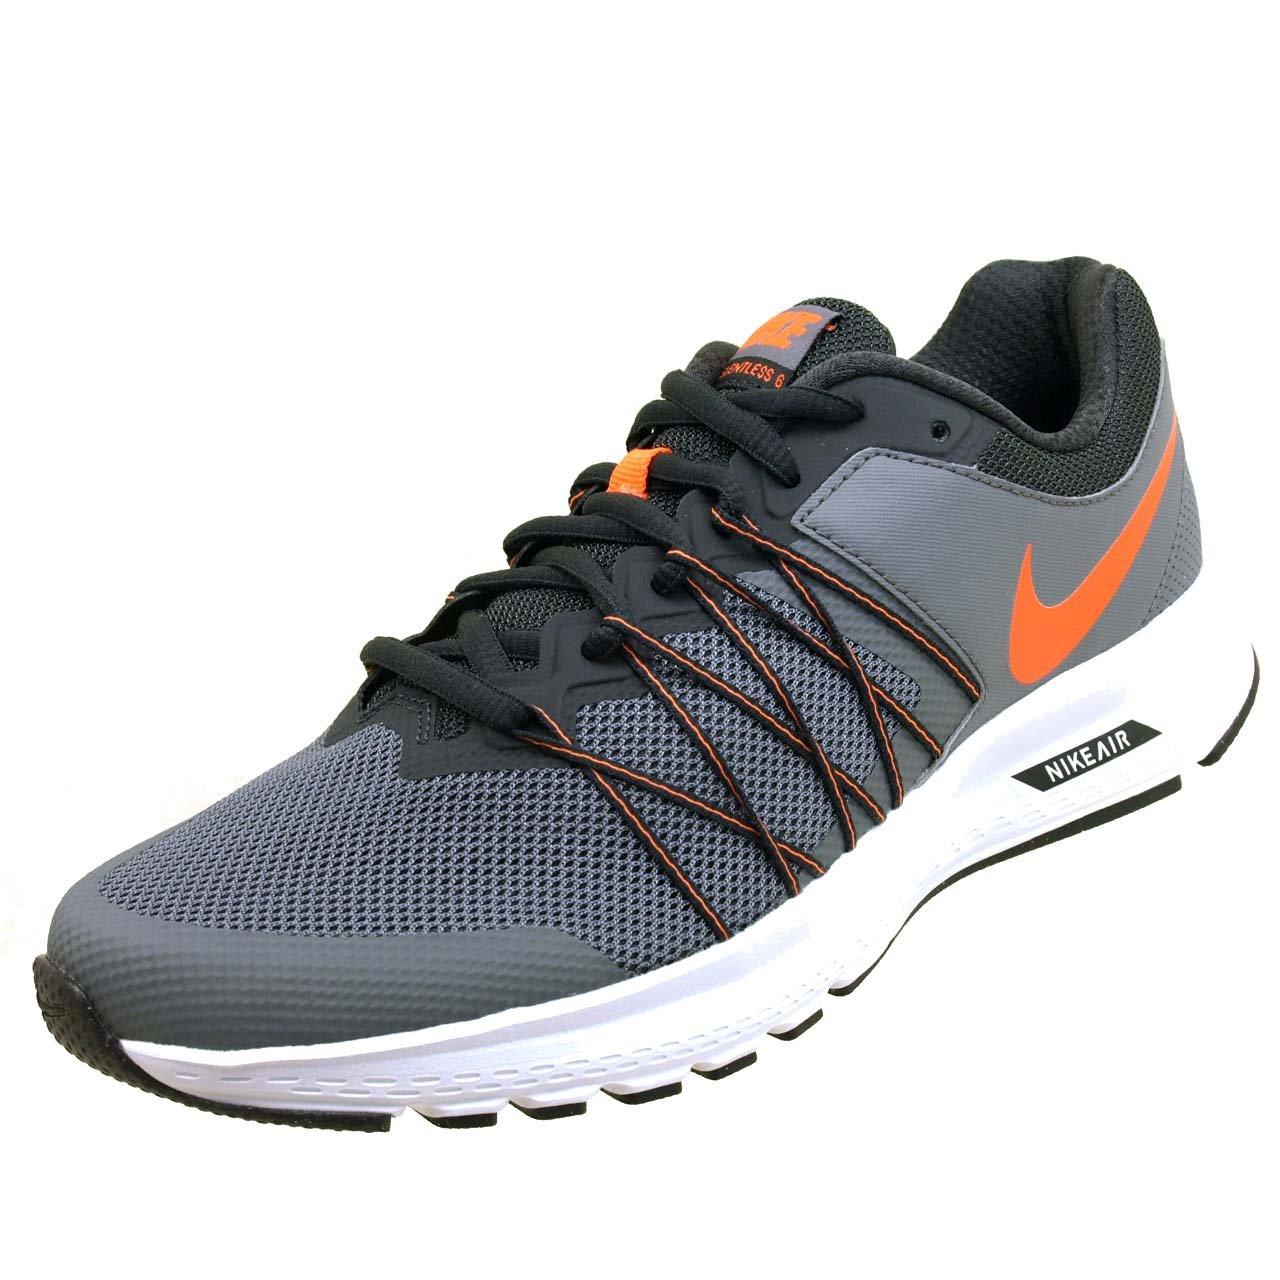 Perspicaz ama de casa farmacéutico  Buy Nike Men's AIR Relentless 6 MSL Grey Running Shoes at Amazon.in